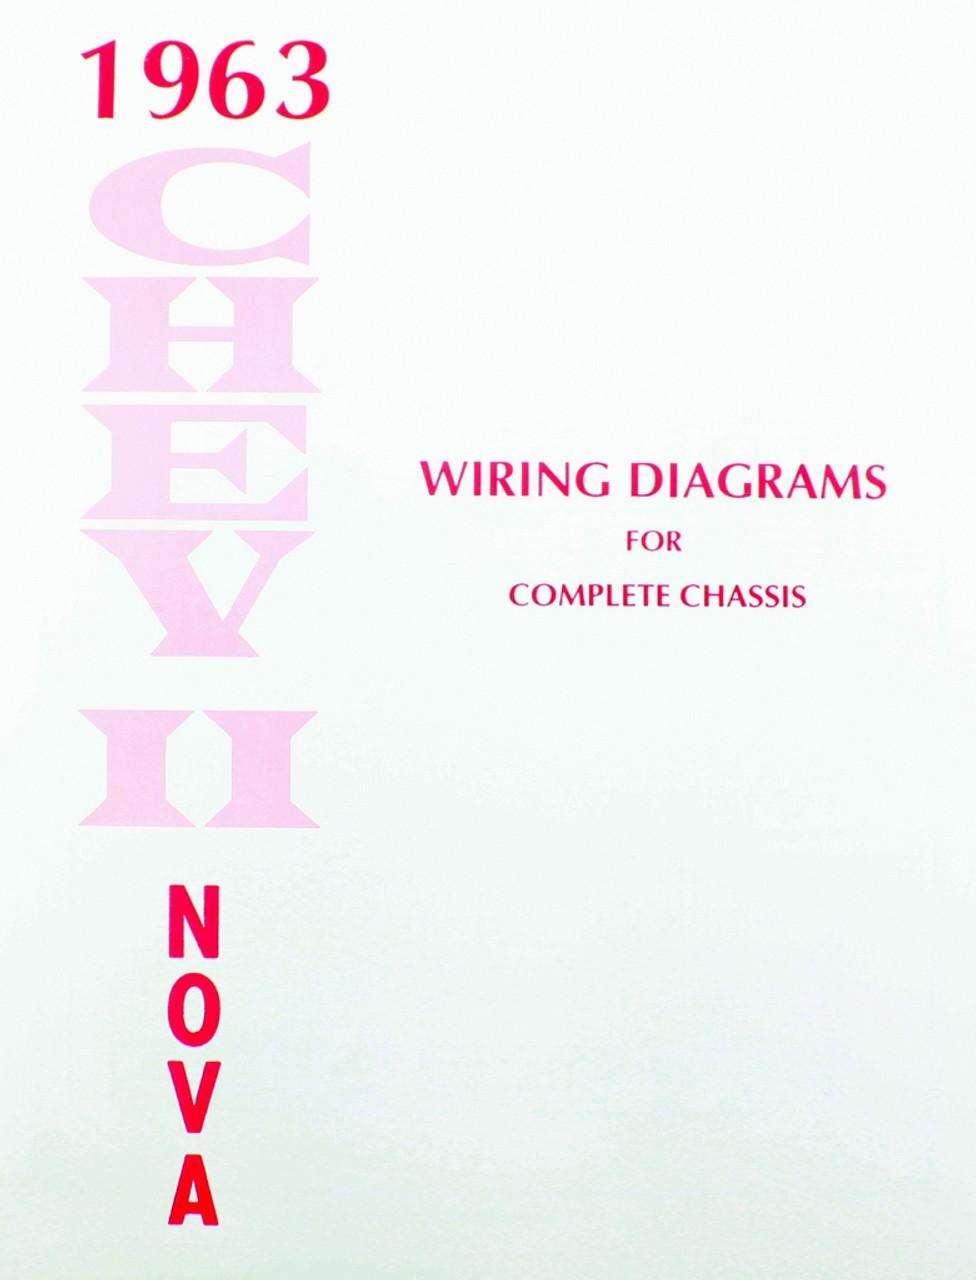 1963 Chevy Ii Nova Wiring Diagram 01 Explorer Sport Fuse Diagram – Ls2600 Kubota Wiring-diagram